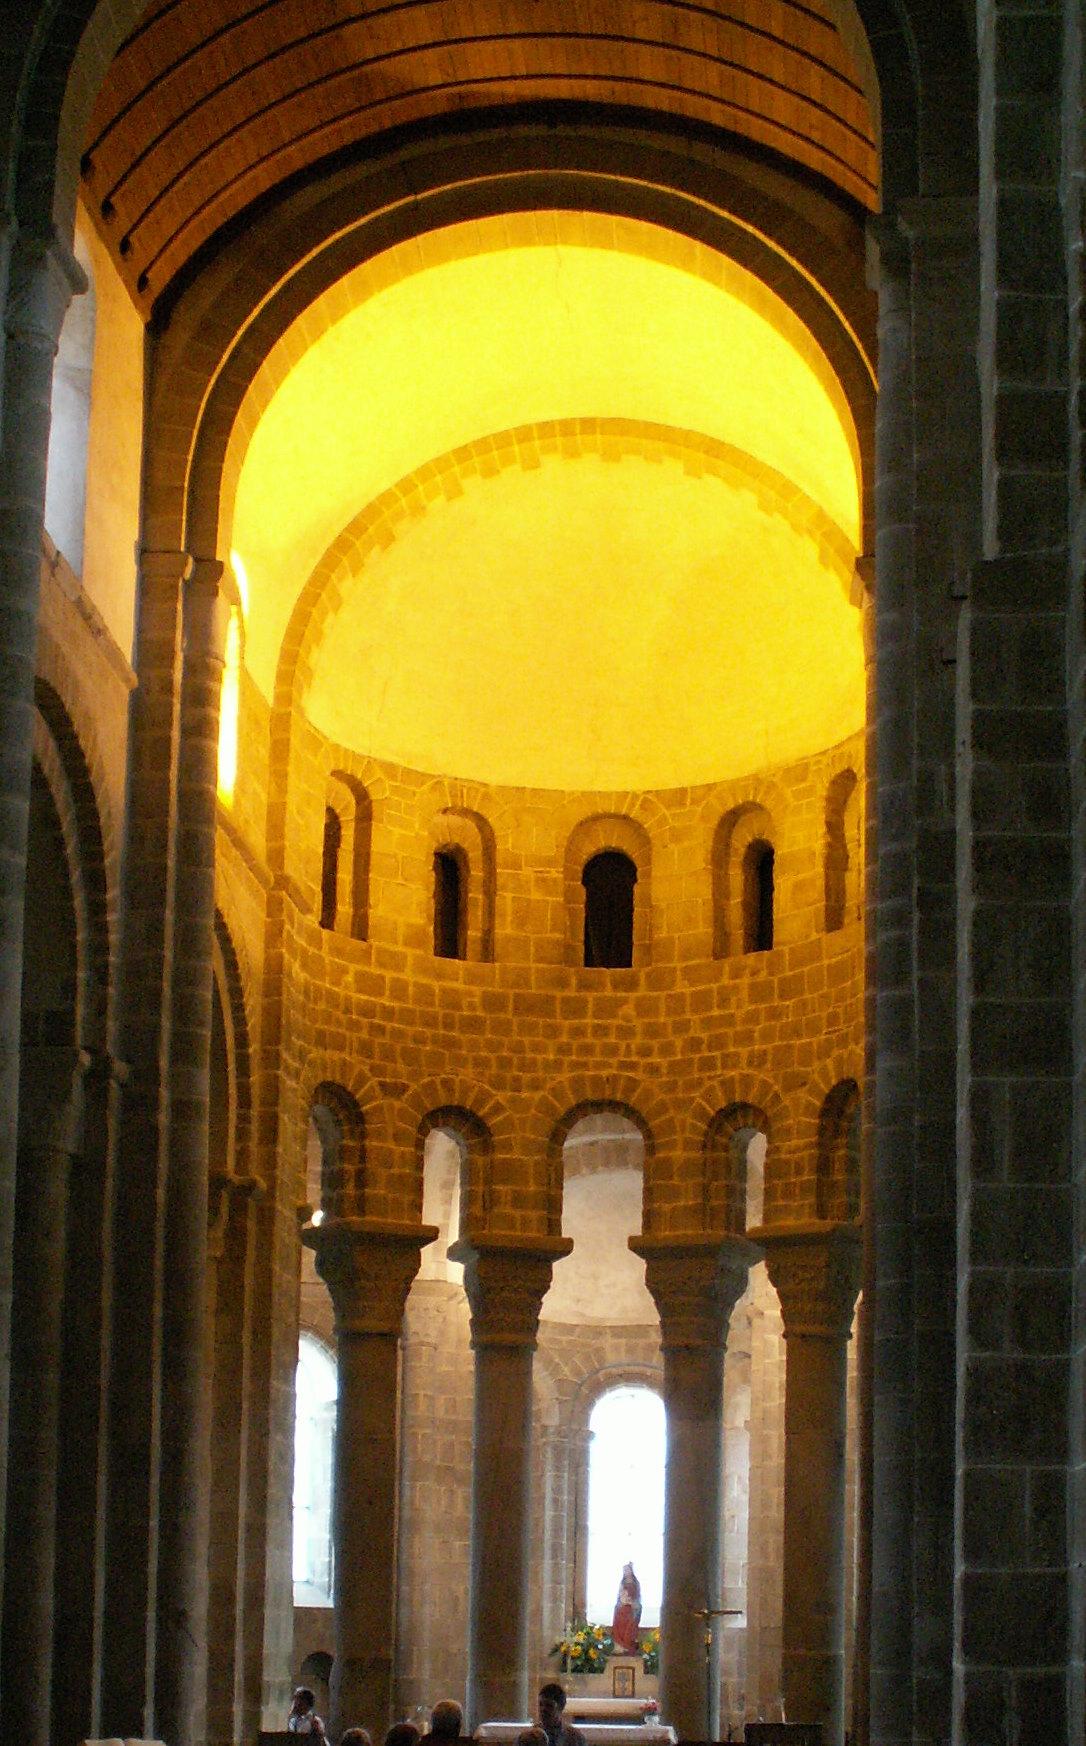 L'église Saint Tudy